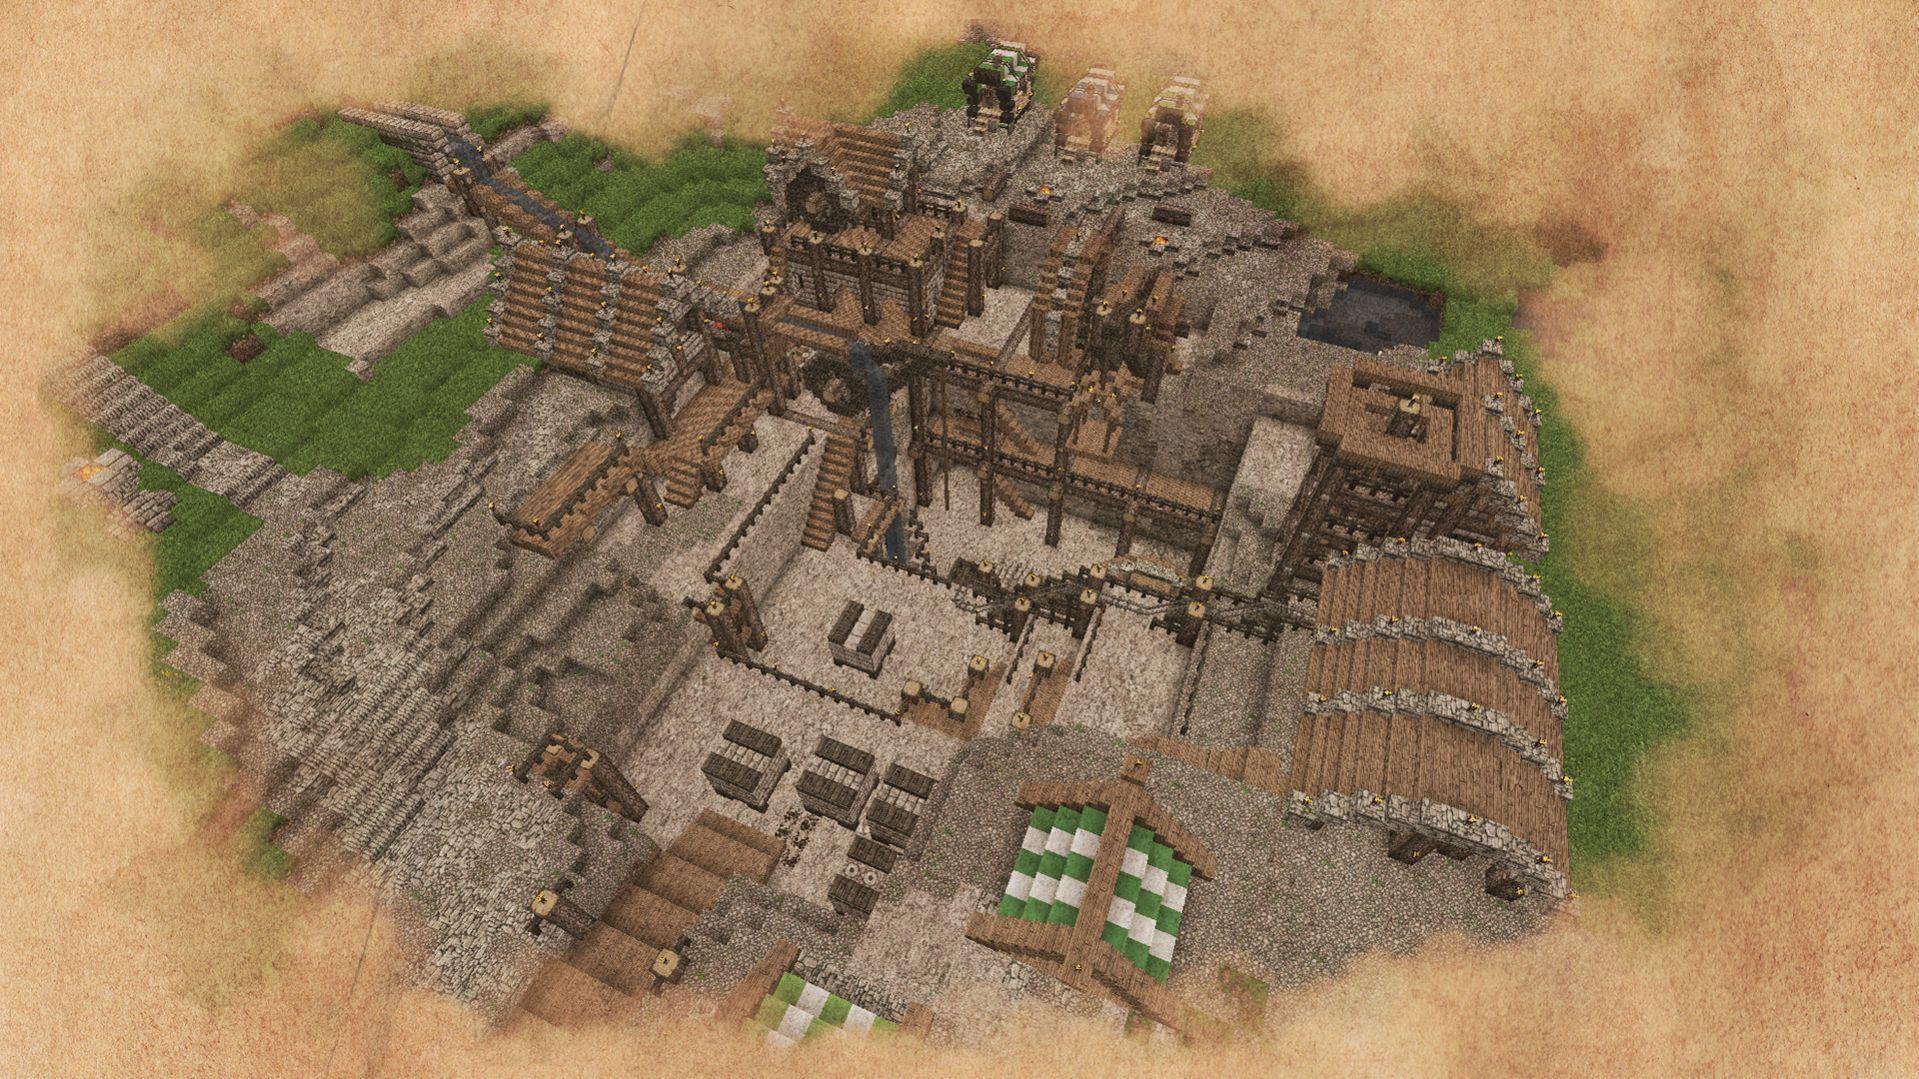 quarry mine | Minecraft medieval, Minecraft blueprints, Minecraft designs